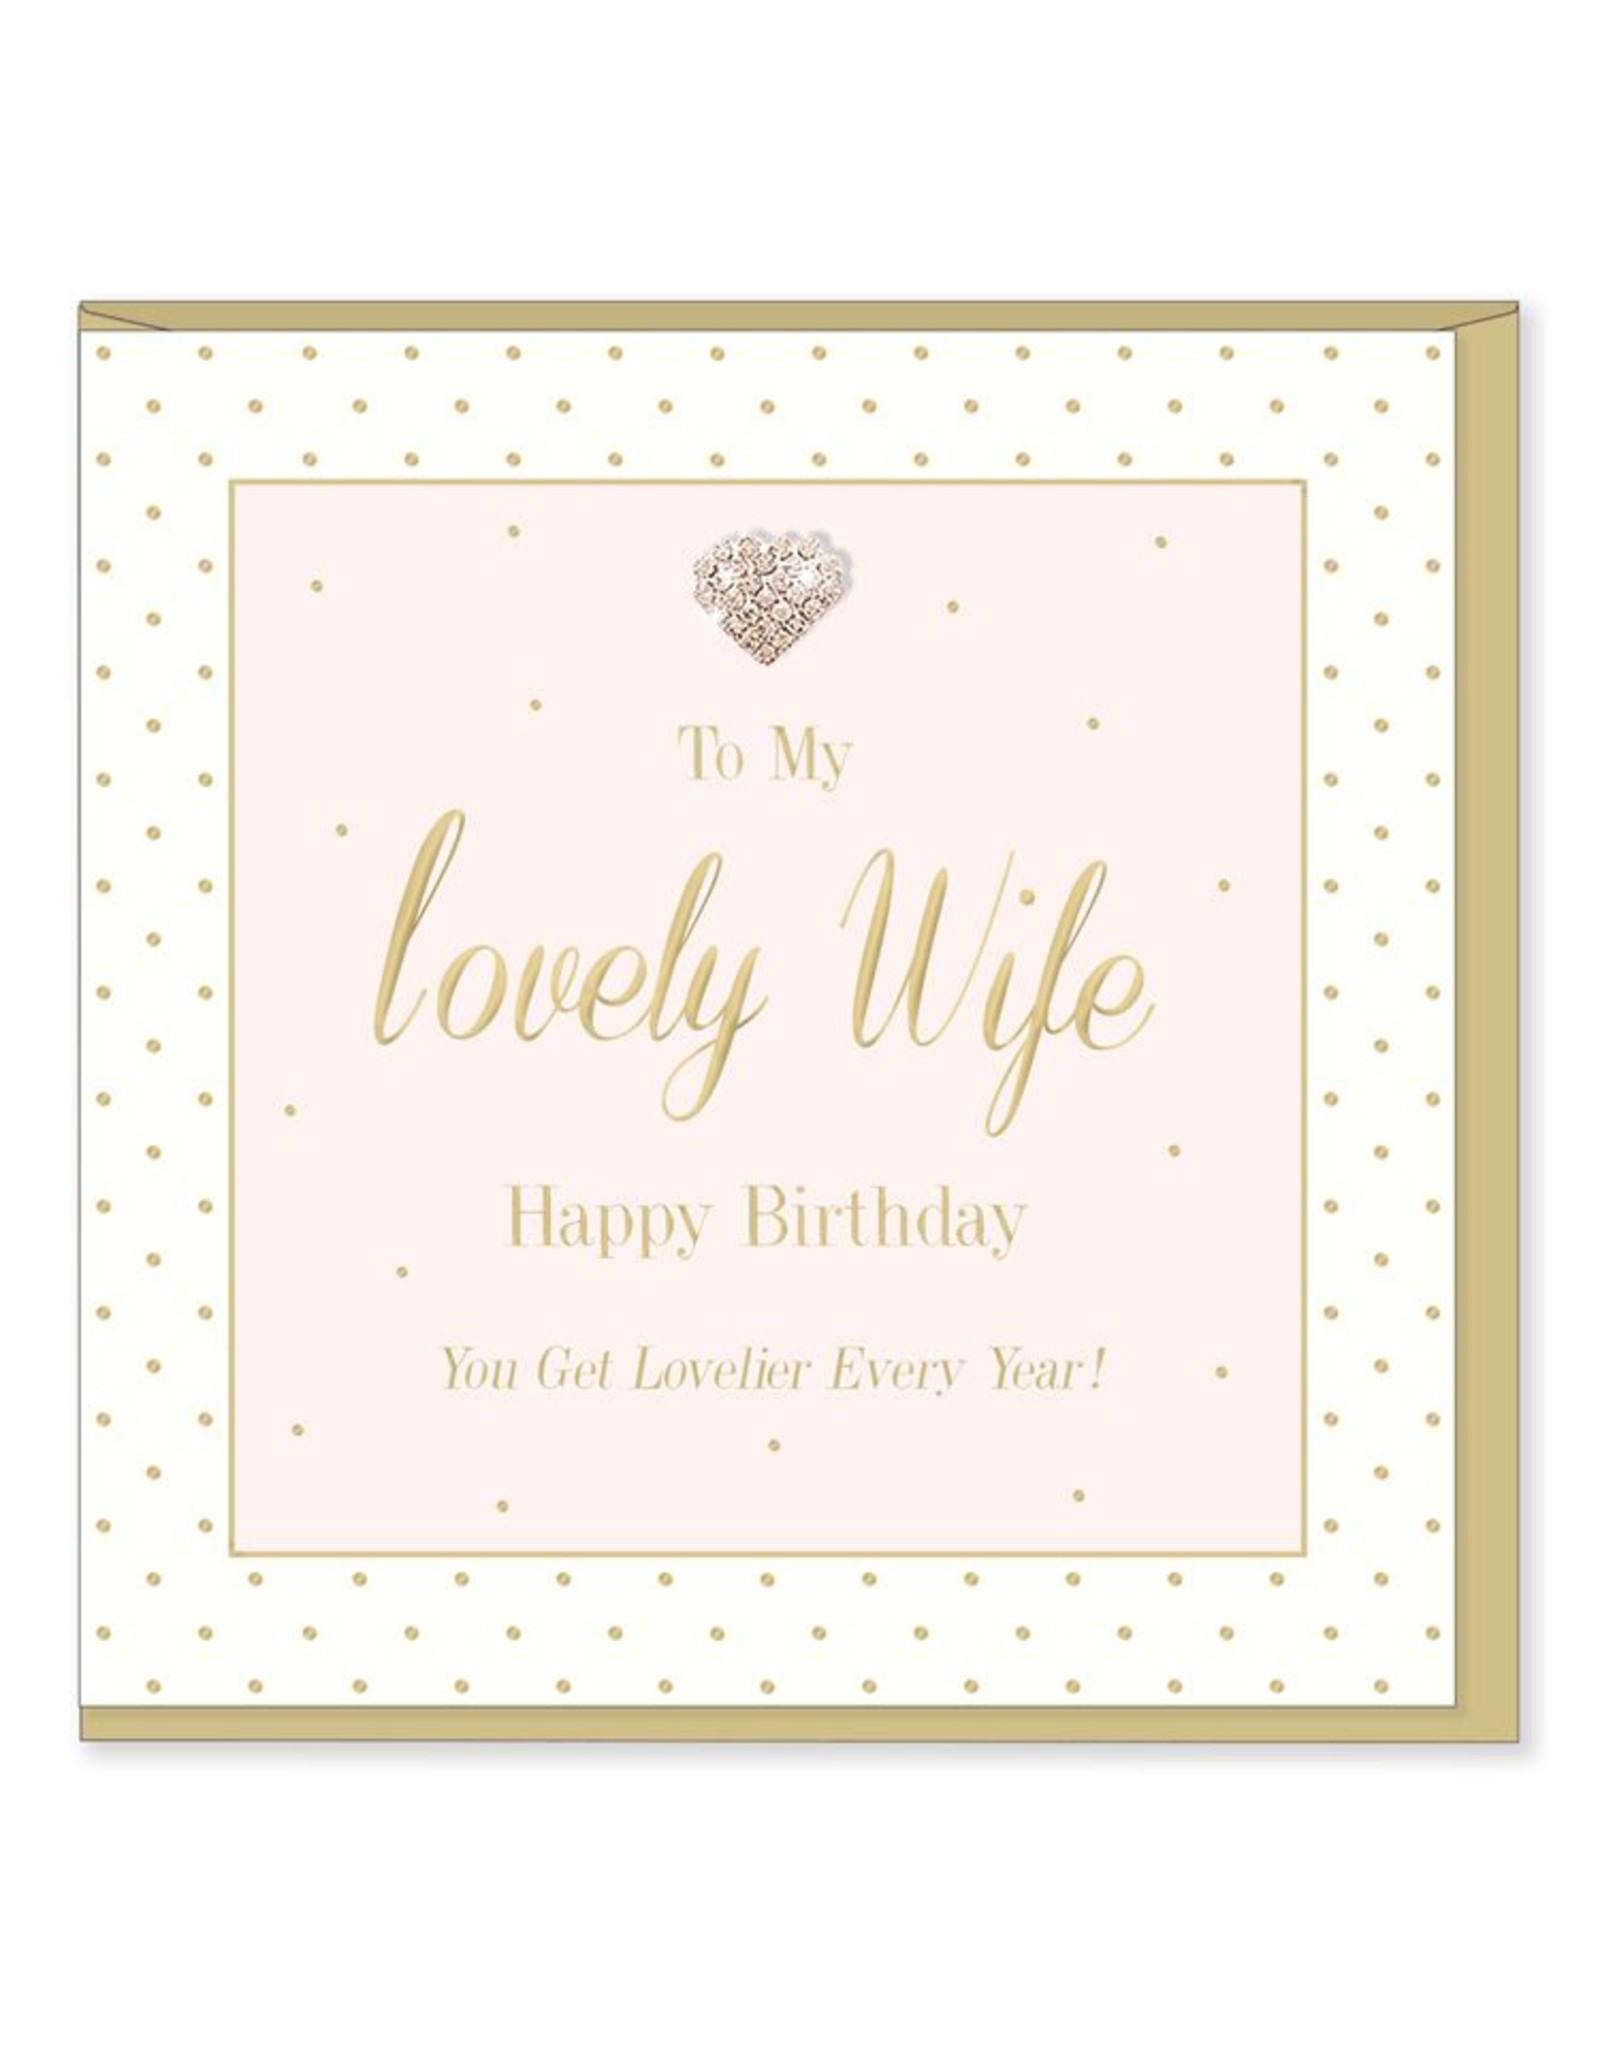 Hearts Design Wenskaart - Lovely Wife - Birthday